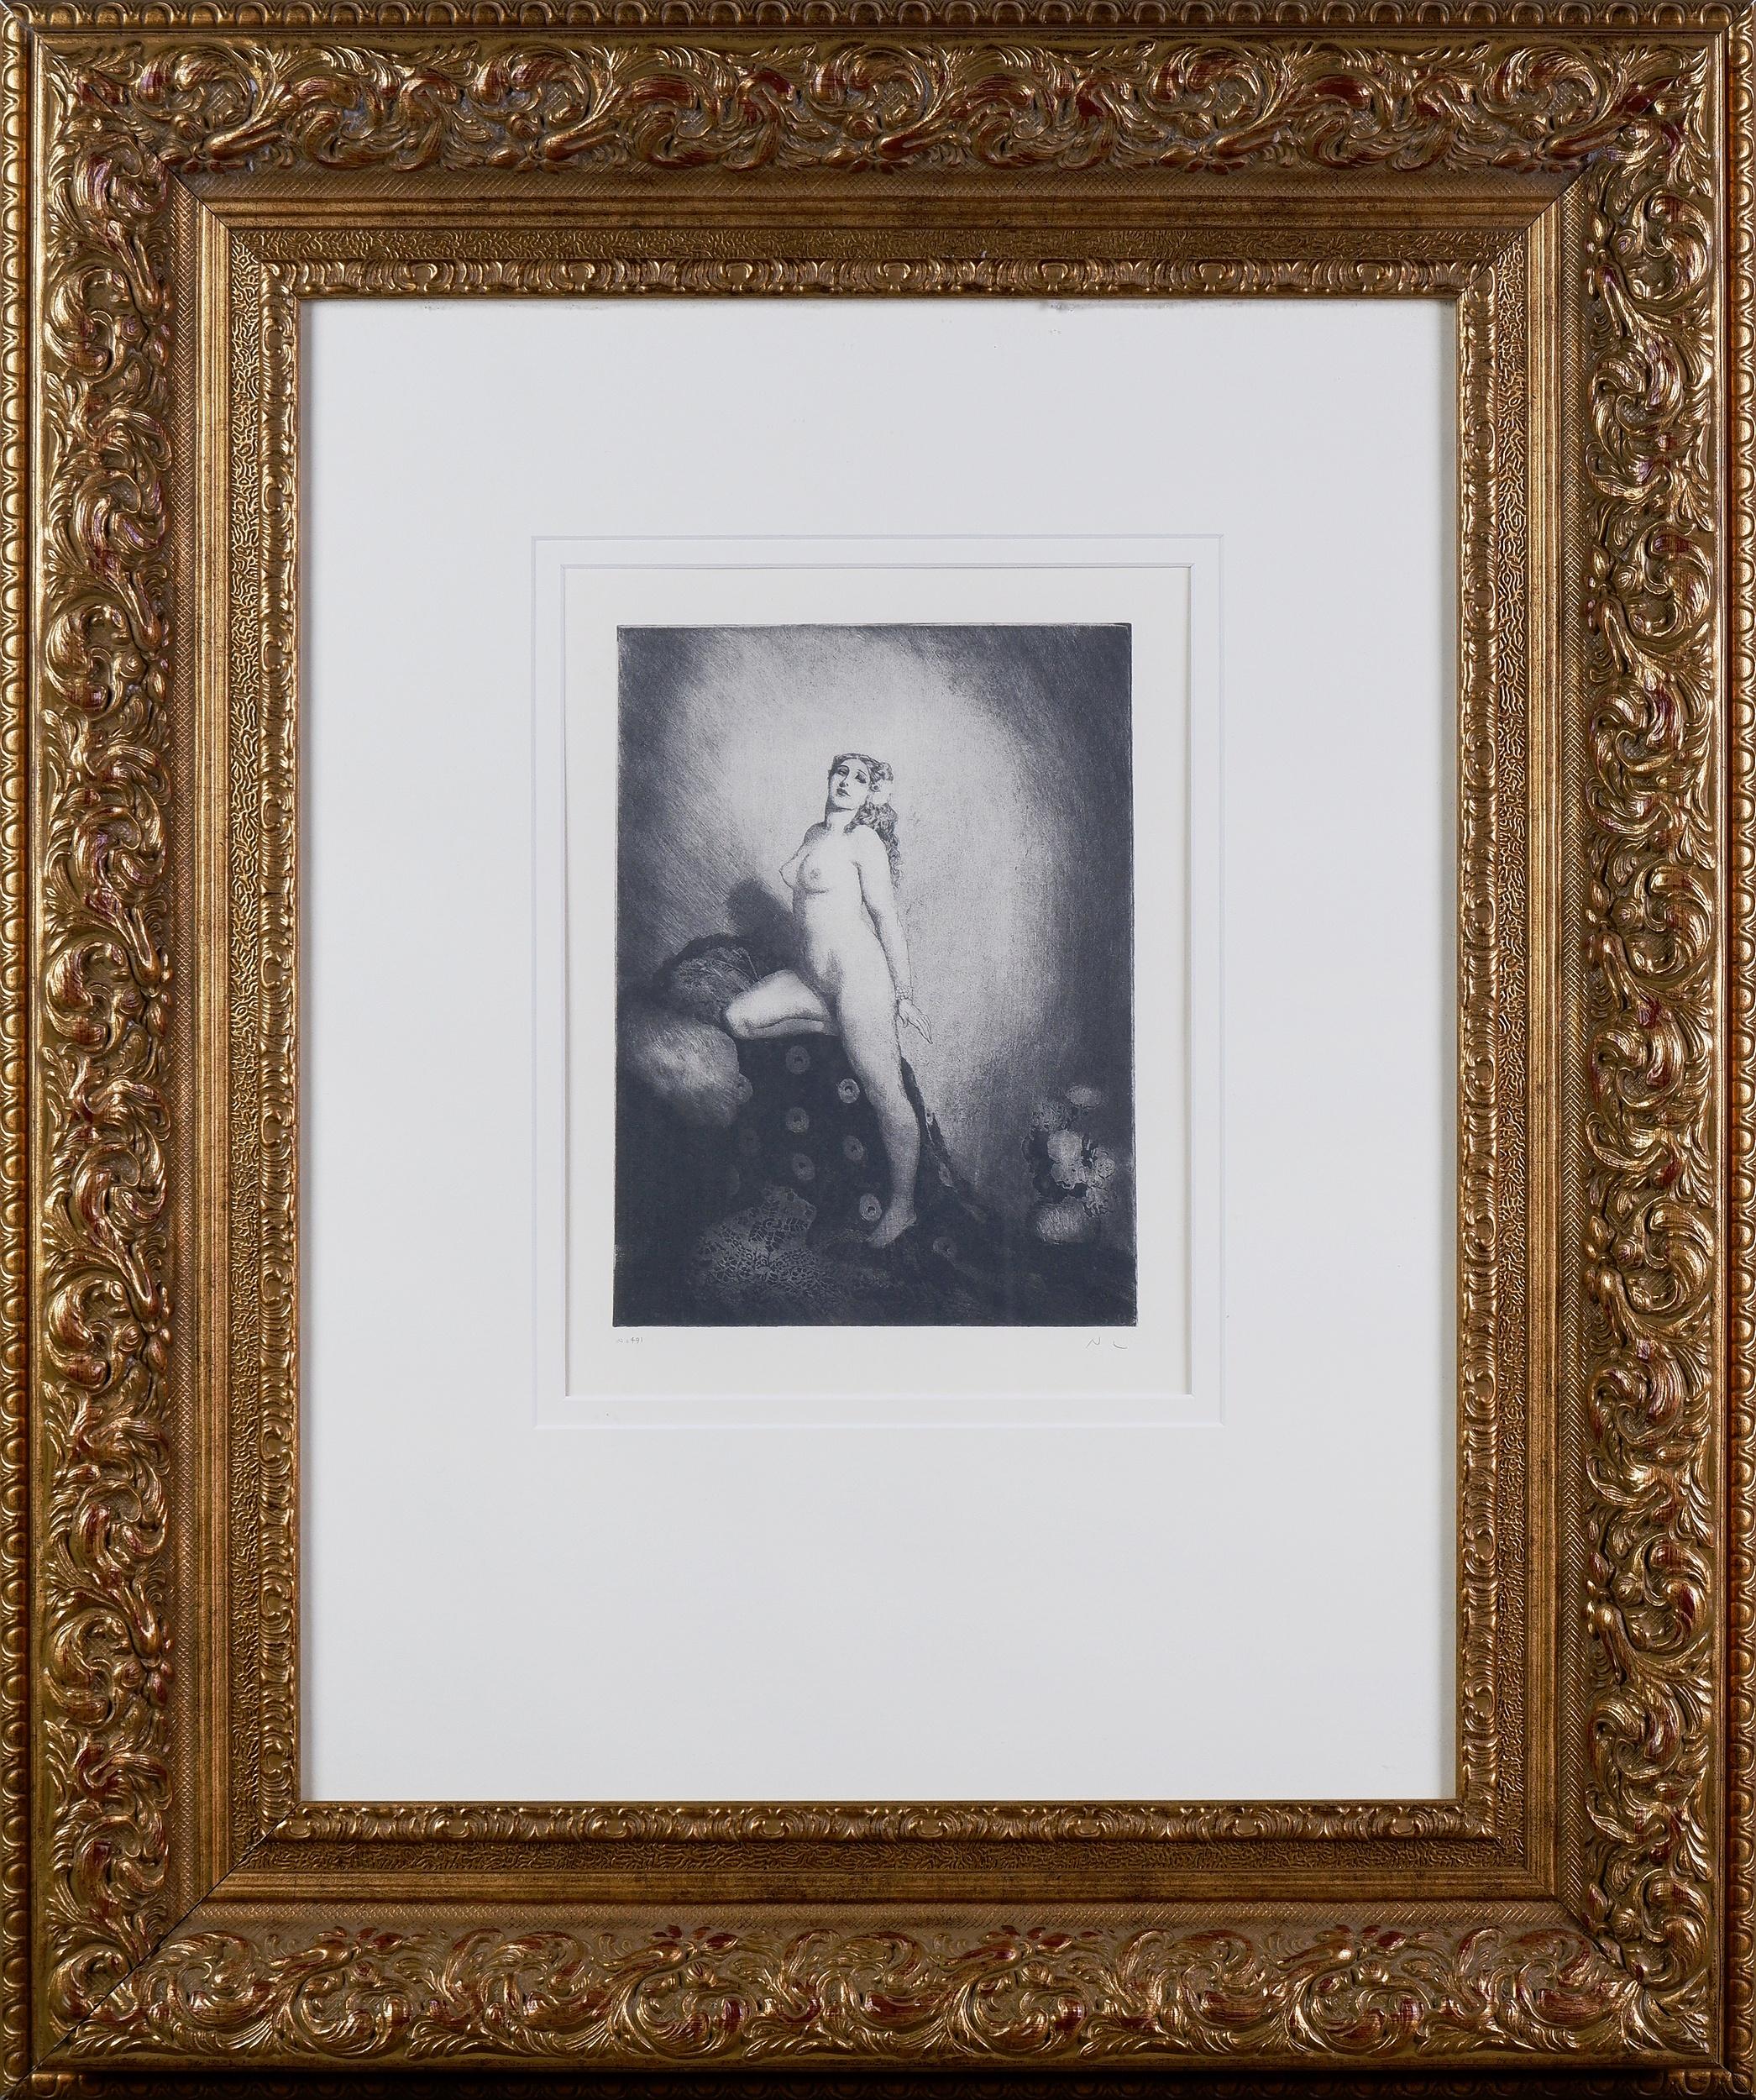 'Norman Lindsay (1879-1969), Memories, Facsimile Etching, 24 x 18 cm (image size)'